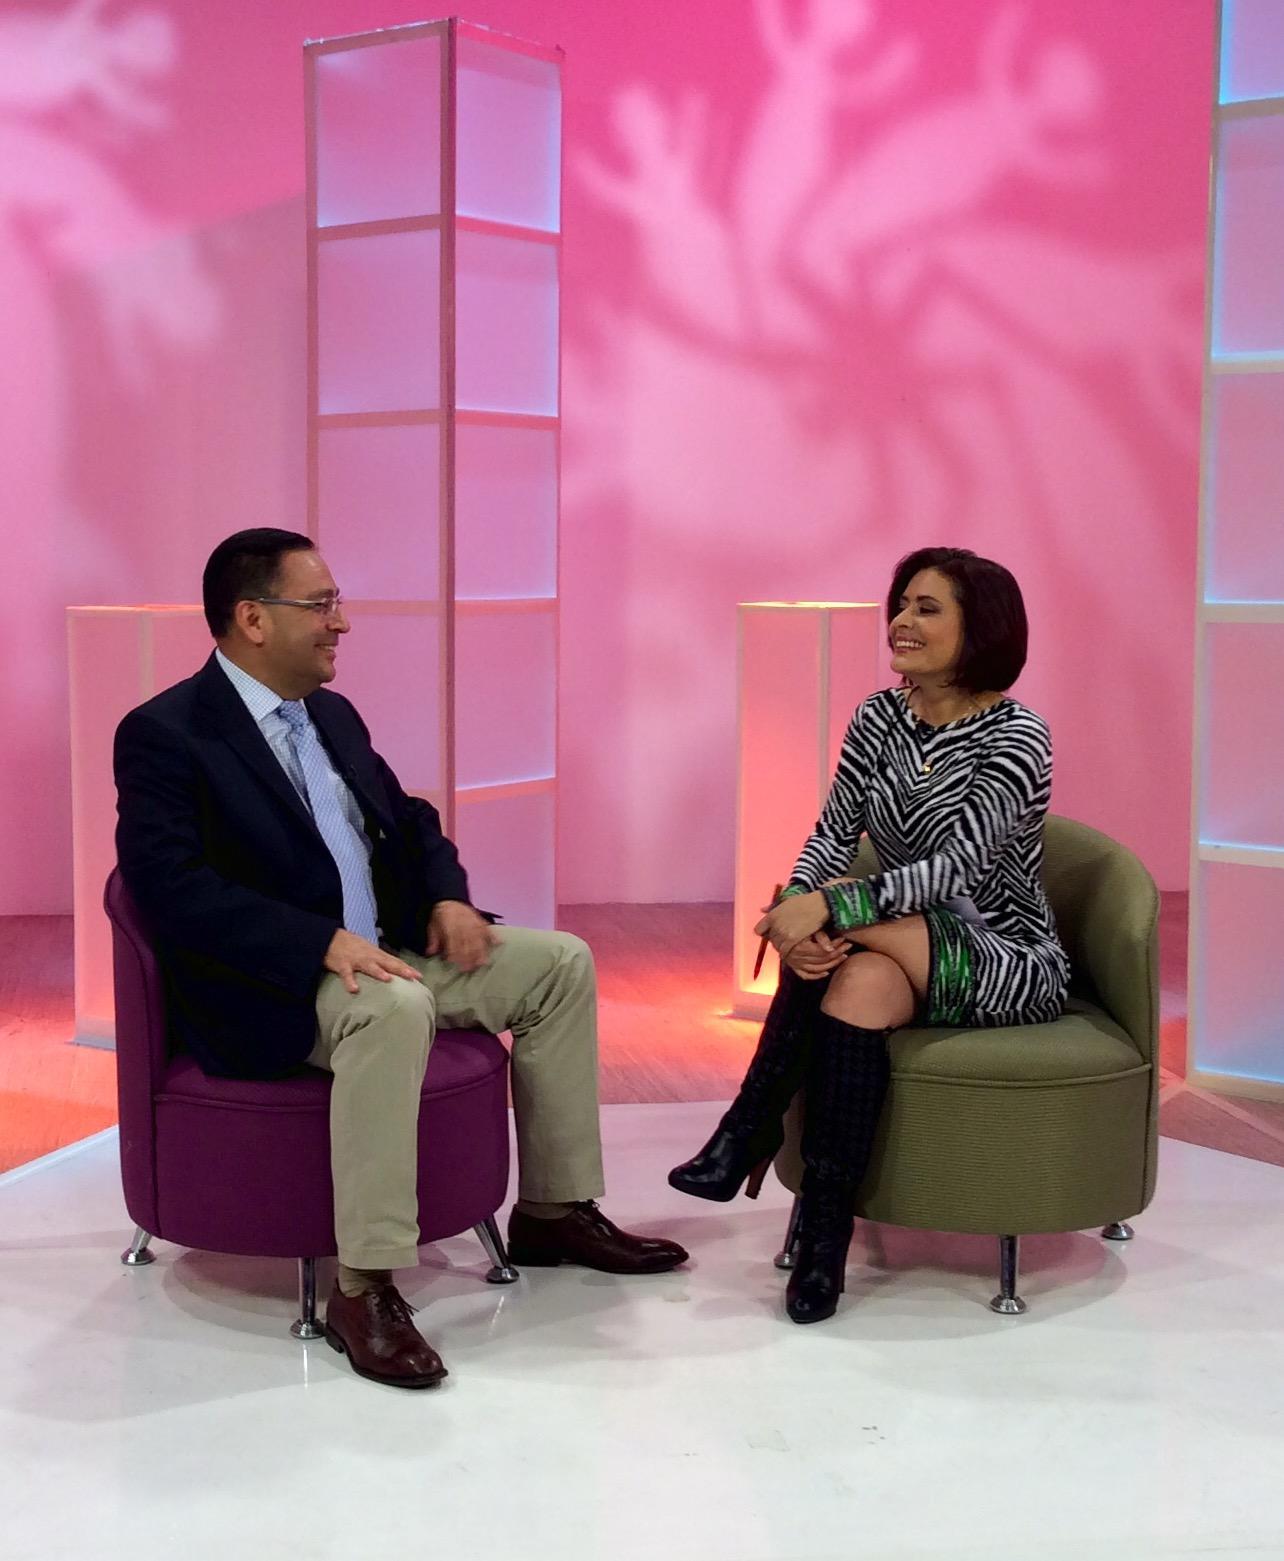 canal 34 tv mexiquense online dating